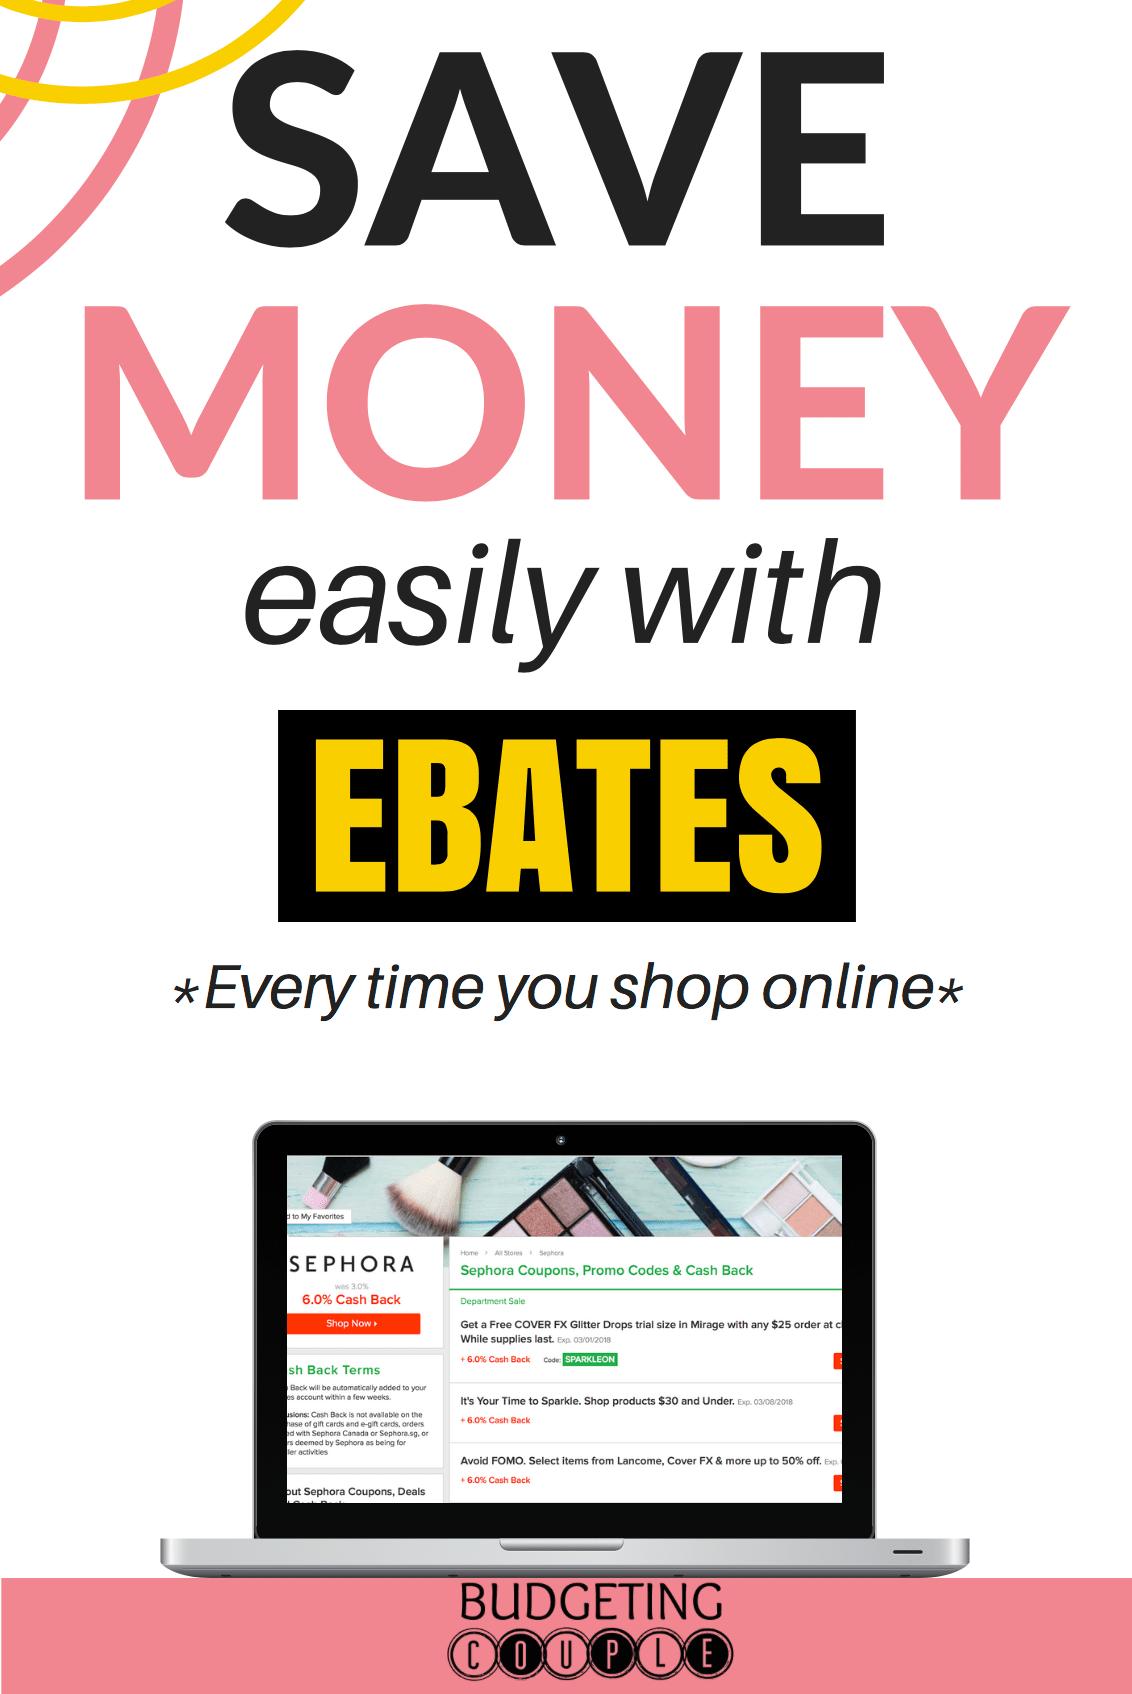 ebates tips, ebates, ebates review, ebates shopping, how to use ebates, ebates hacks, ebates website, ebates hacks when shopping on a budget